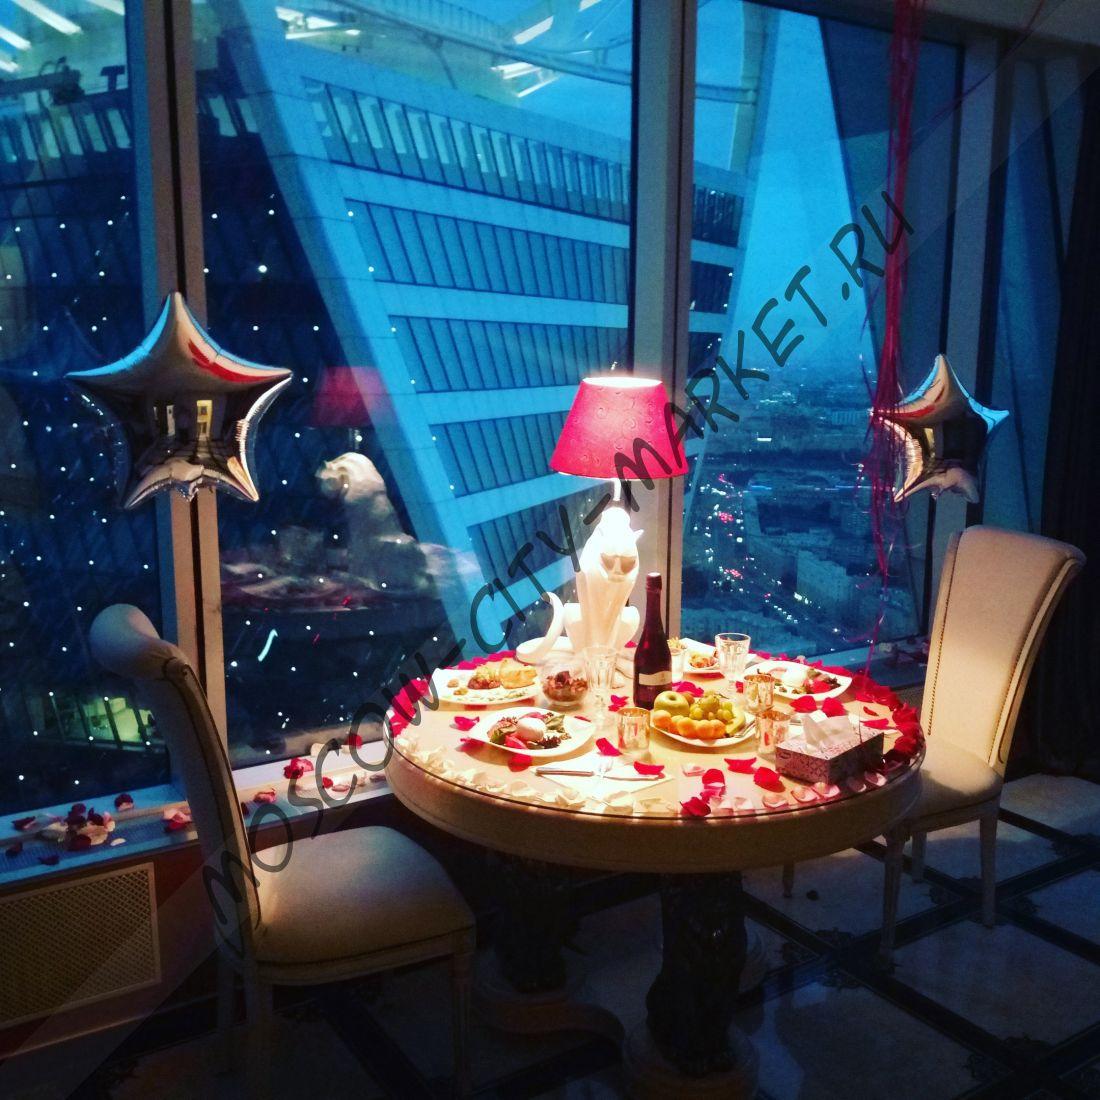 Подъем в небоскреб+прогулка на теплоходе Соларис с ужином